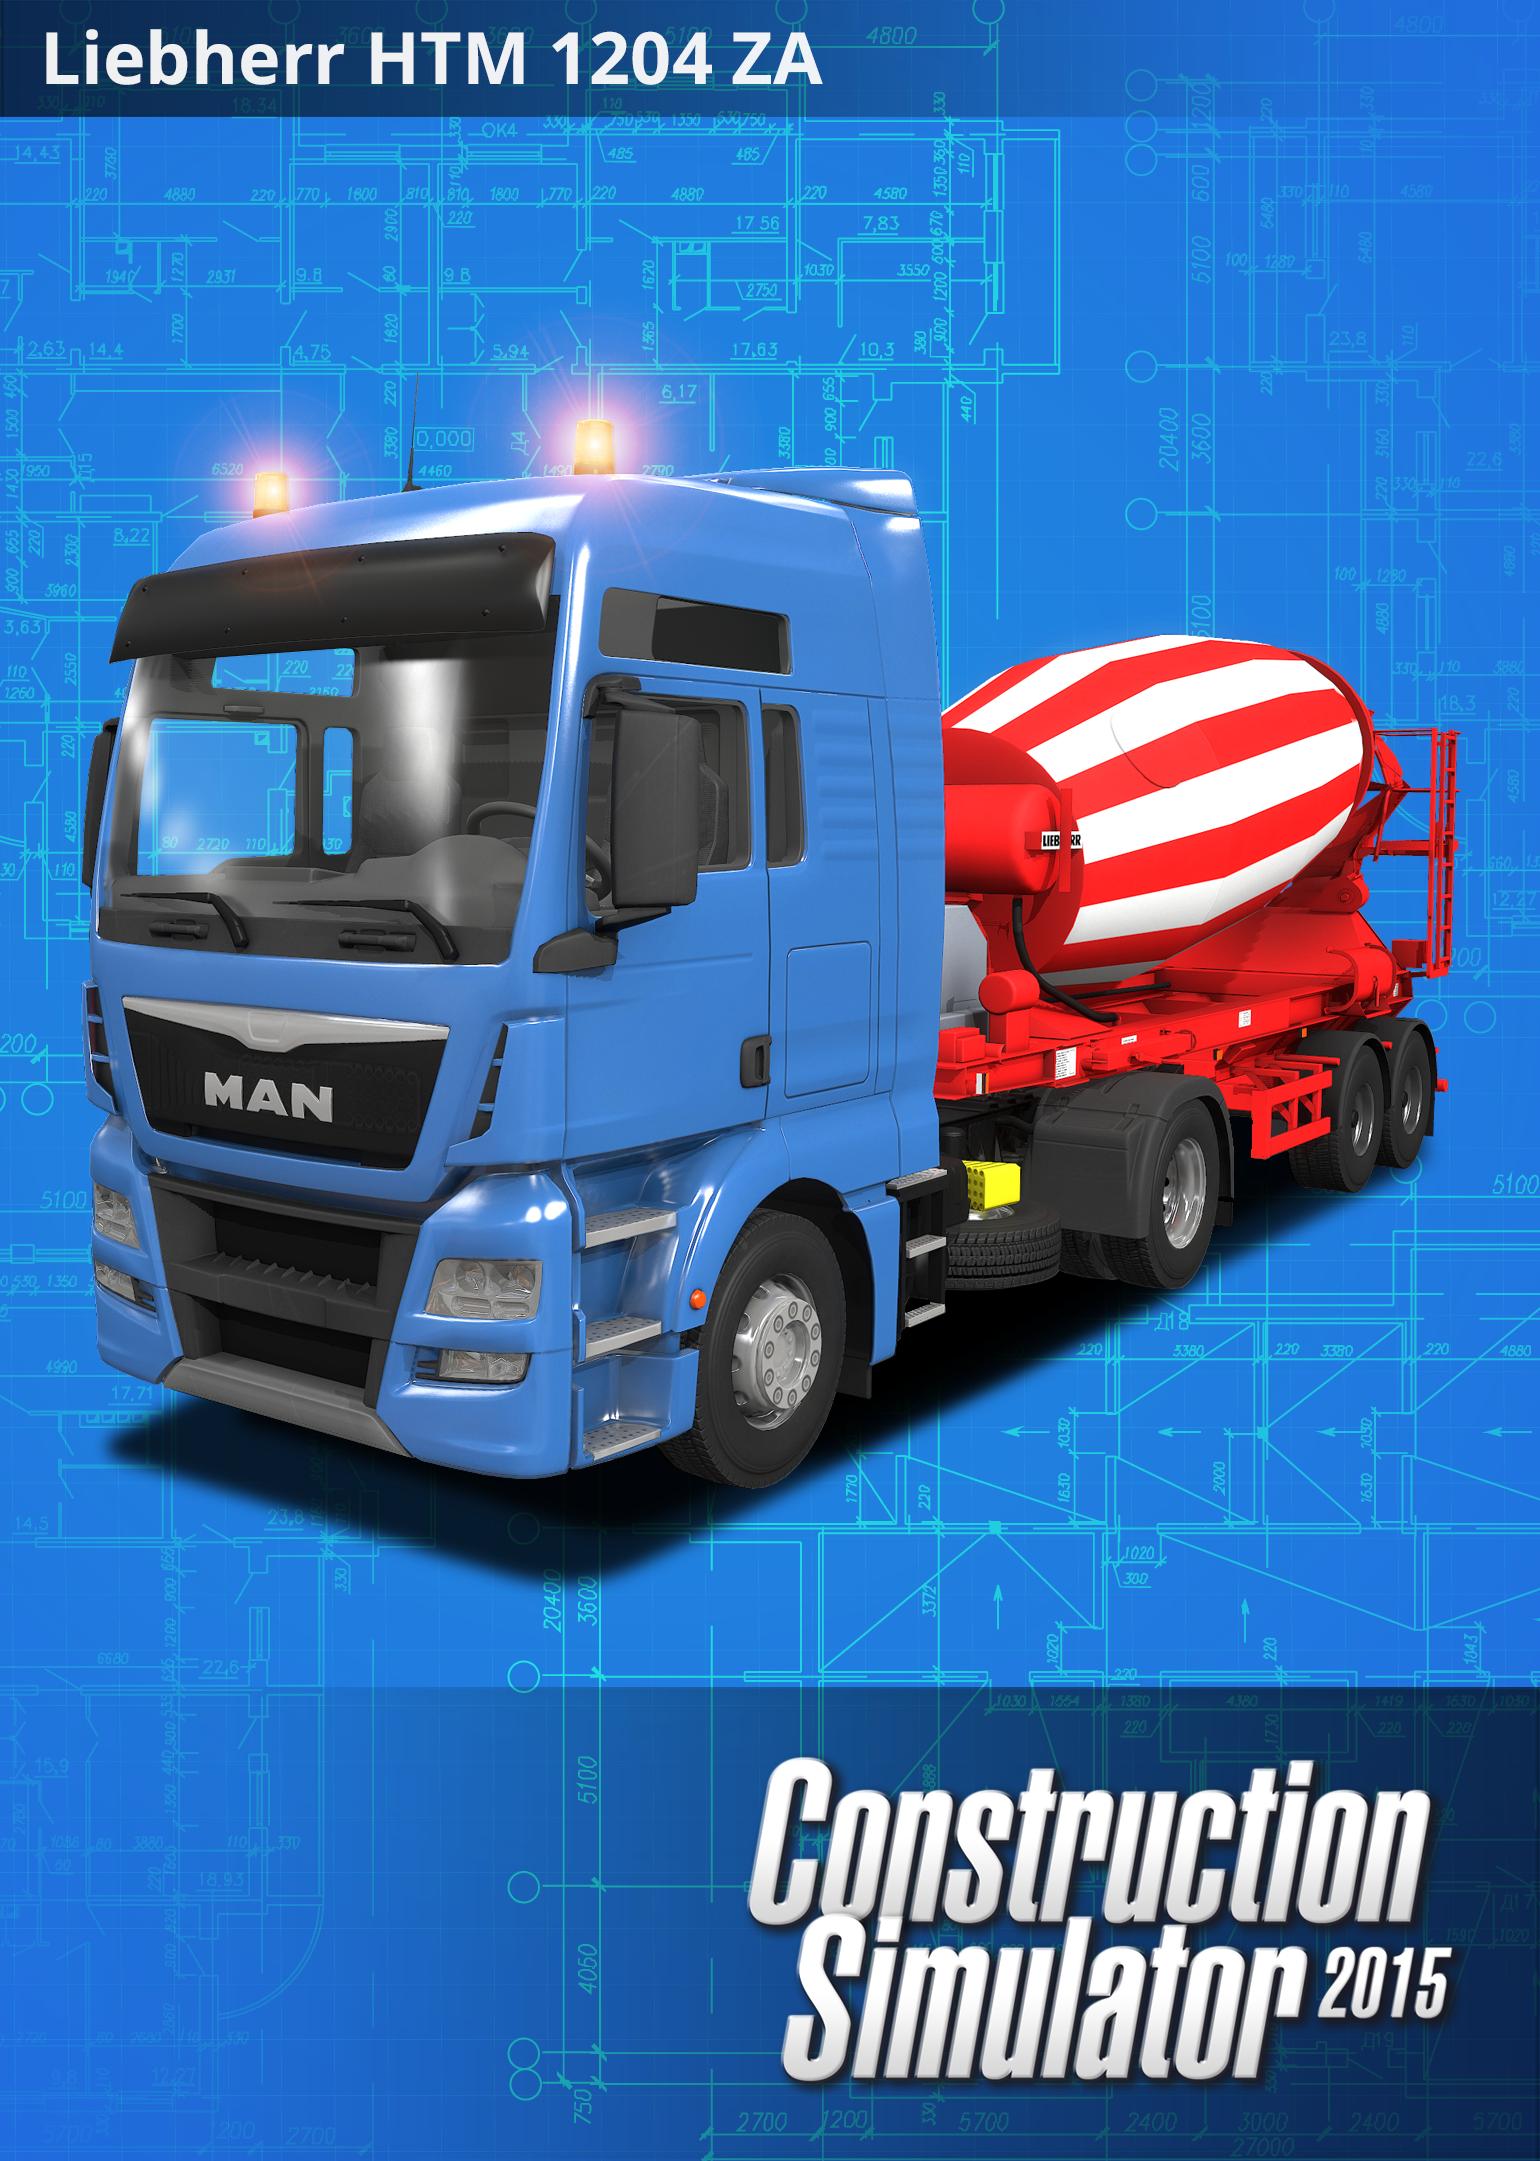 construction-simulator-2015-liebherr-htm-1204-za-pc-mac-code-steam